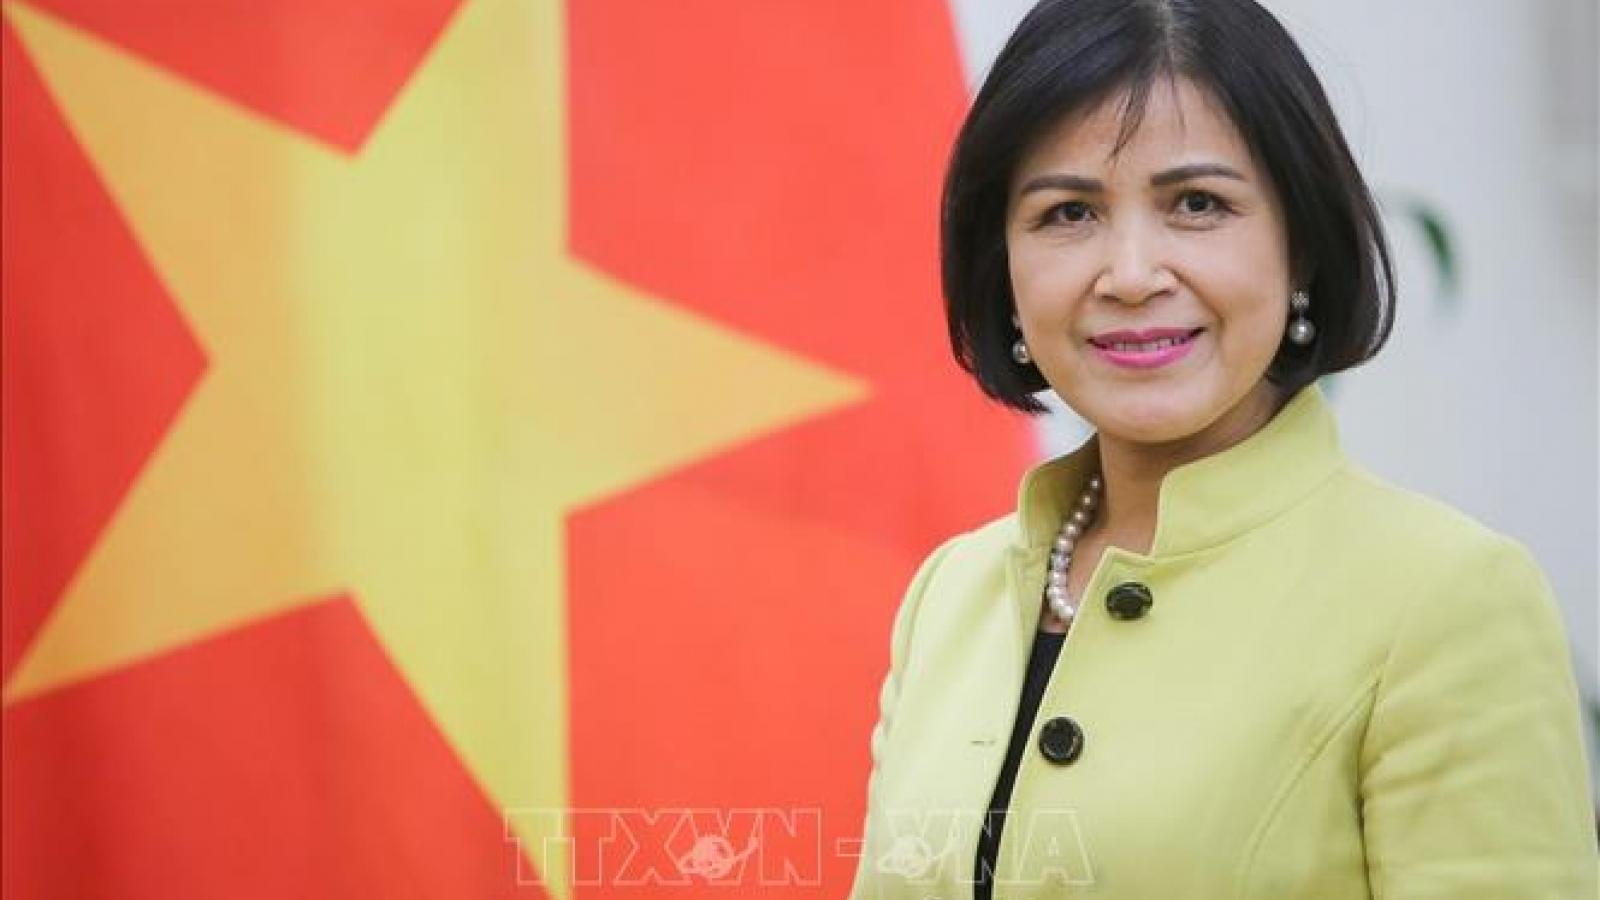 Vietnam aspires to gain experience in building circular economy